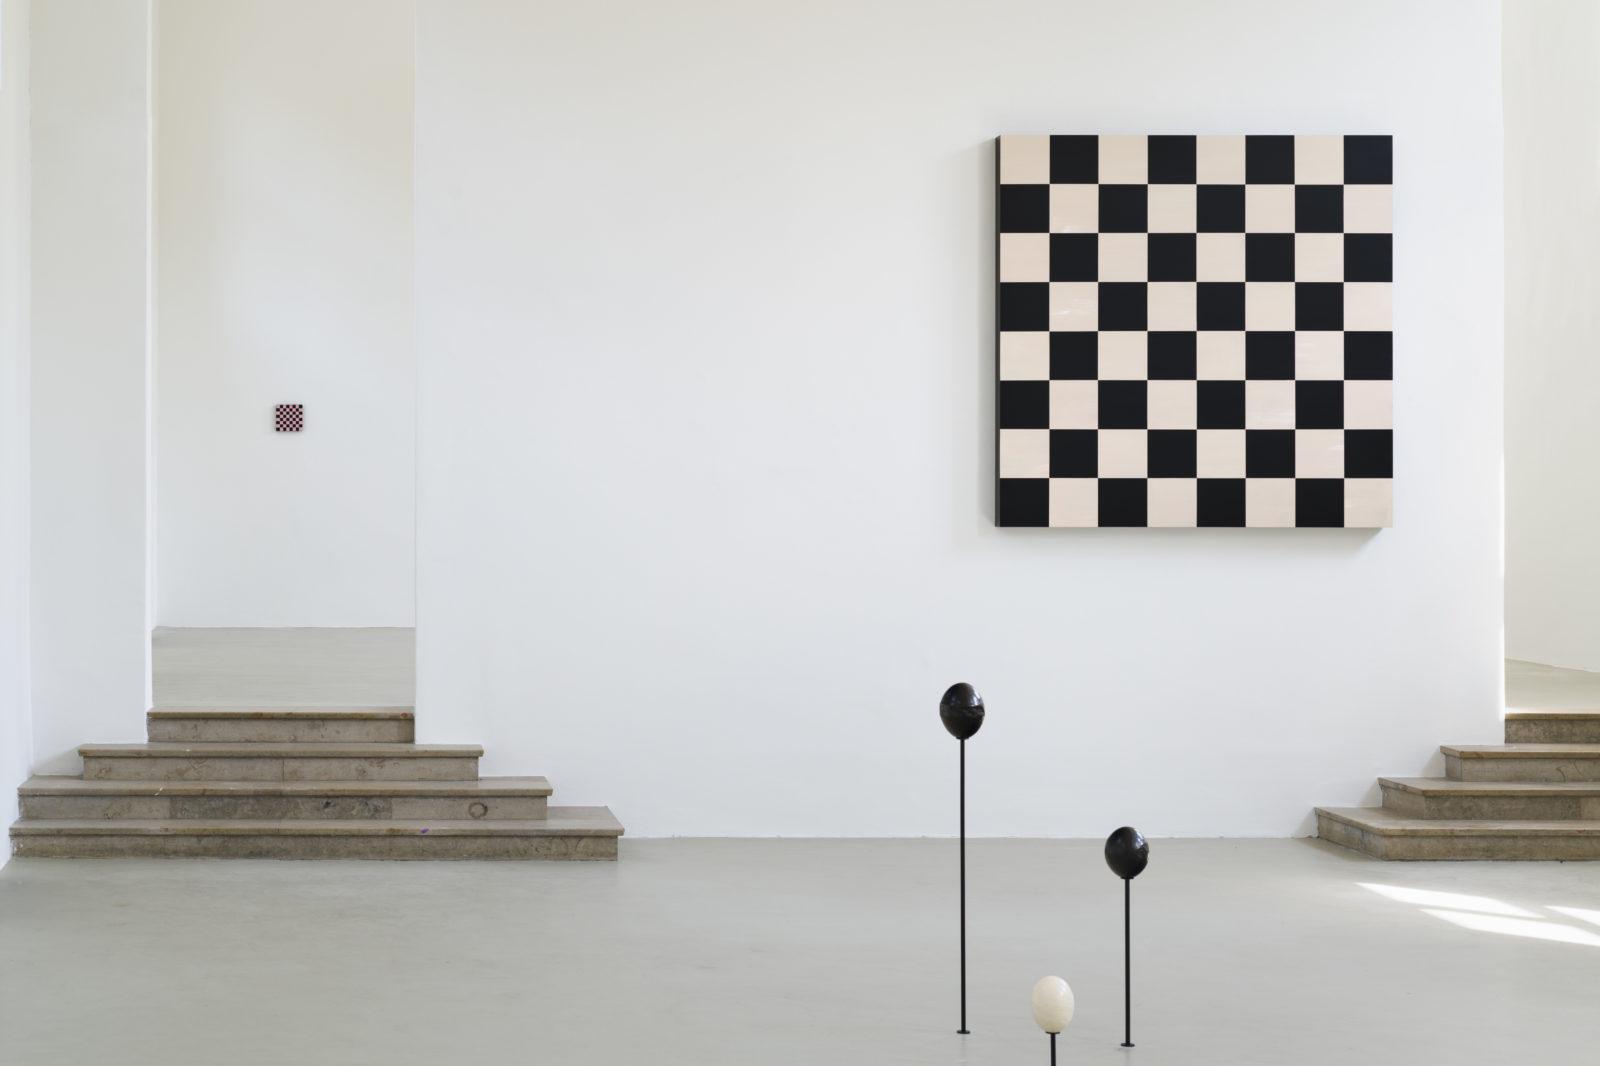 Image: Sarah Ortmeyer. Installation view, FLYRT, at the Kunstverein Münich. Copyright Sarah Ortmeyer. Photographer: Peter Motchi.